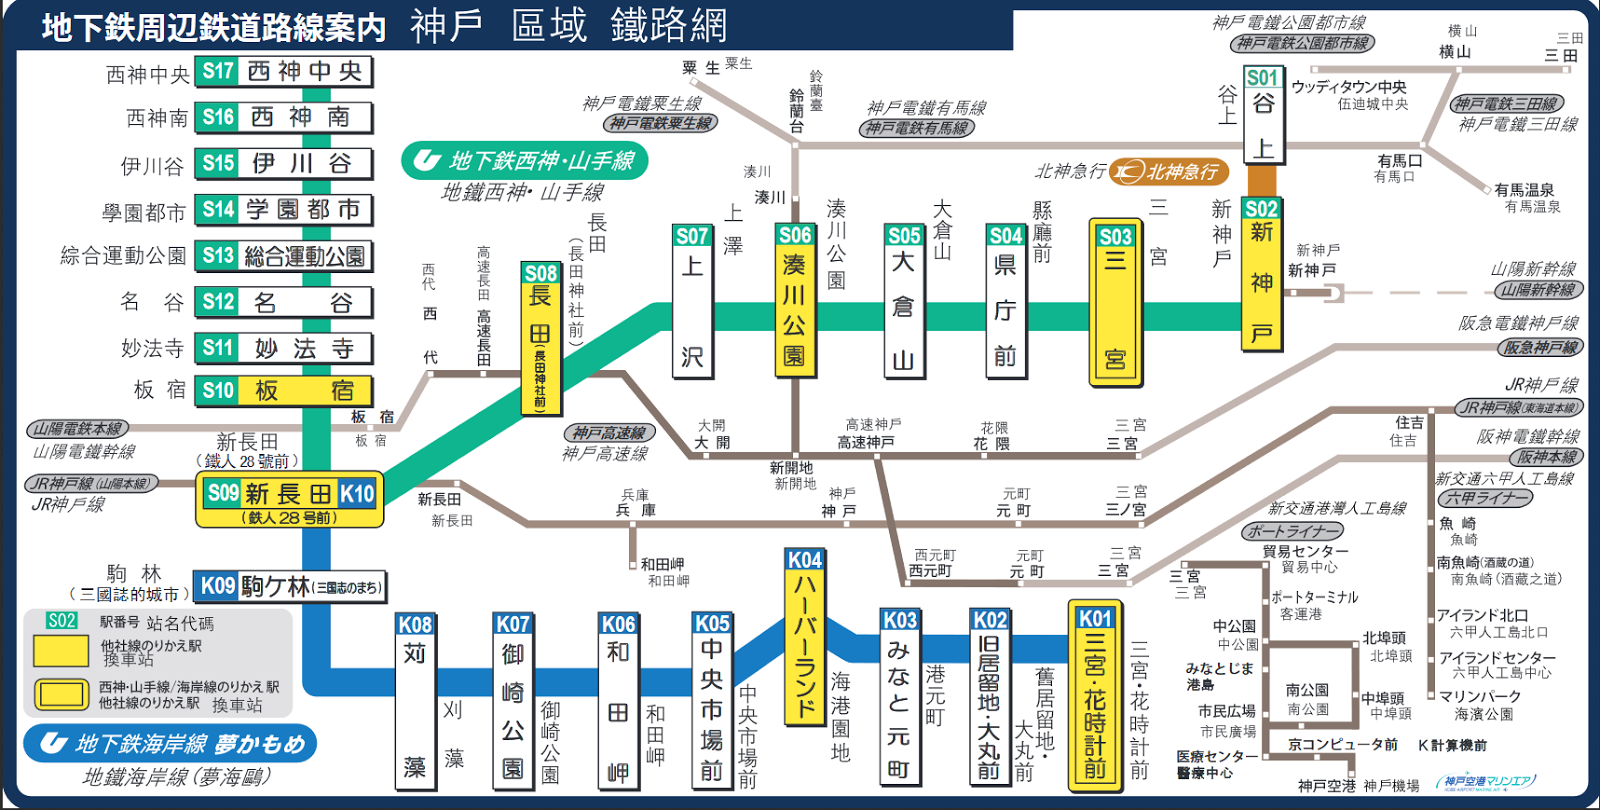 %25E7%25A5%259E%25E6%2588%25B6-%25E5%259C%25B0%25E9%2590%25B5-%25E8%25B7%25AF%25E7%25B7%259A%25E5%259C%2596-Kobe-subway-map-關西-大阪-京都-神戶-奈良-交通-教學-JR-地鐵-私鐵-介紹